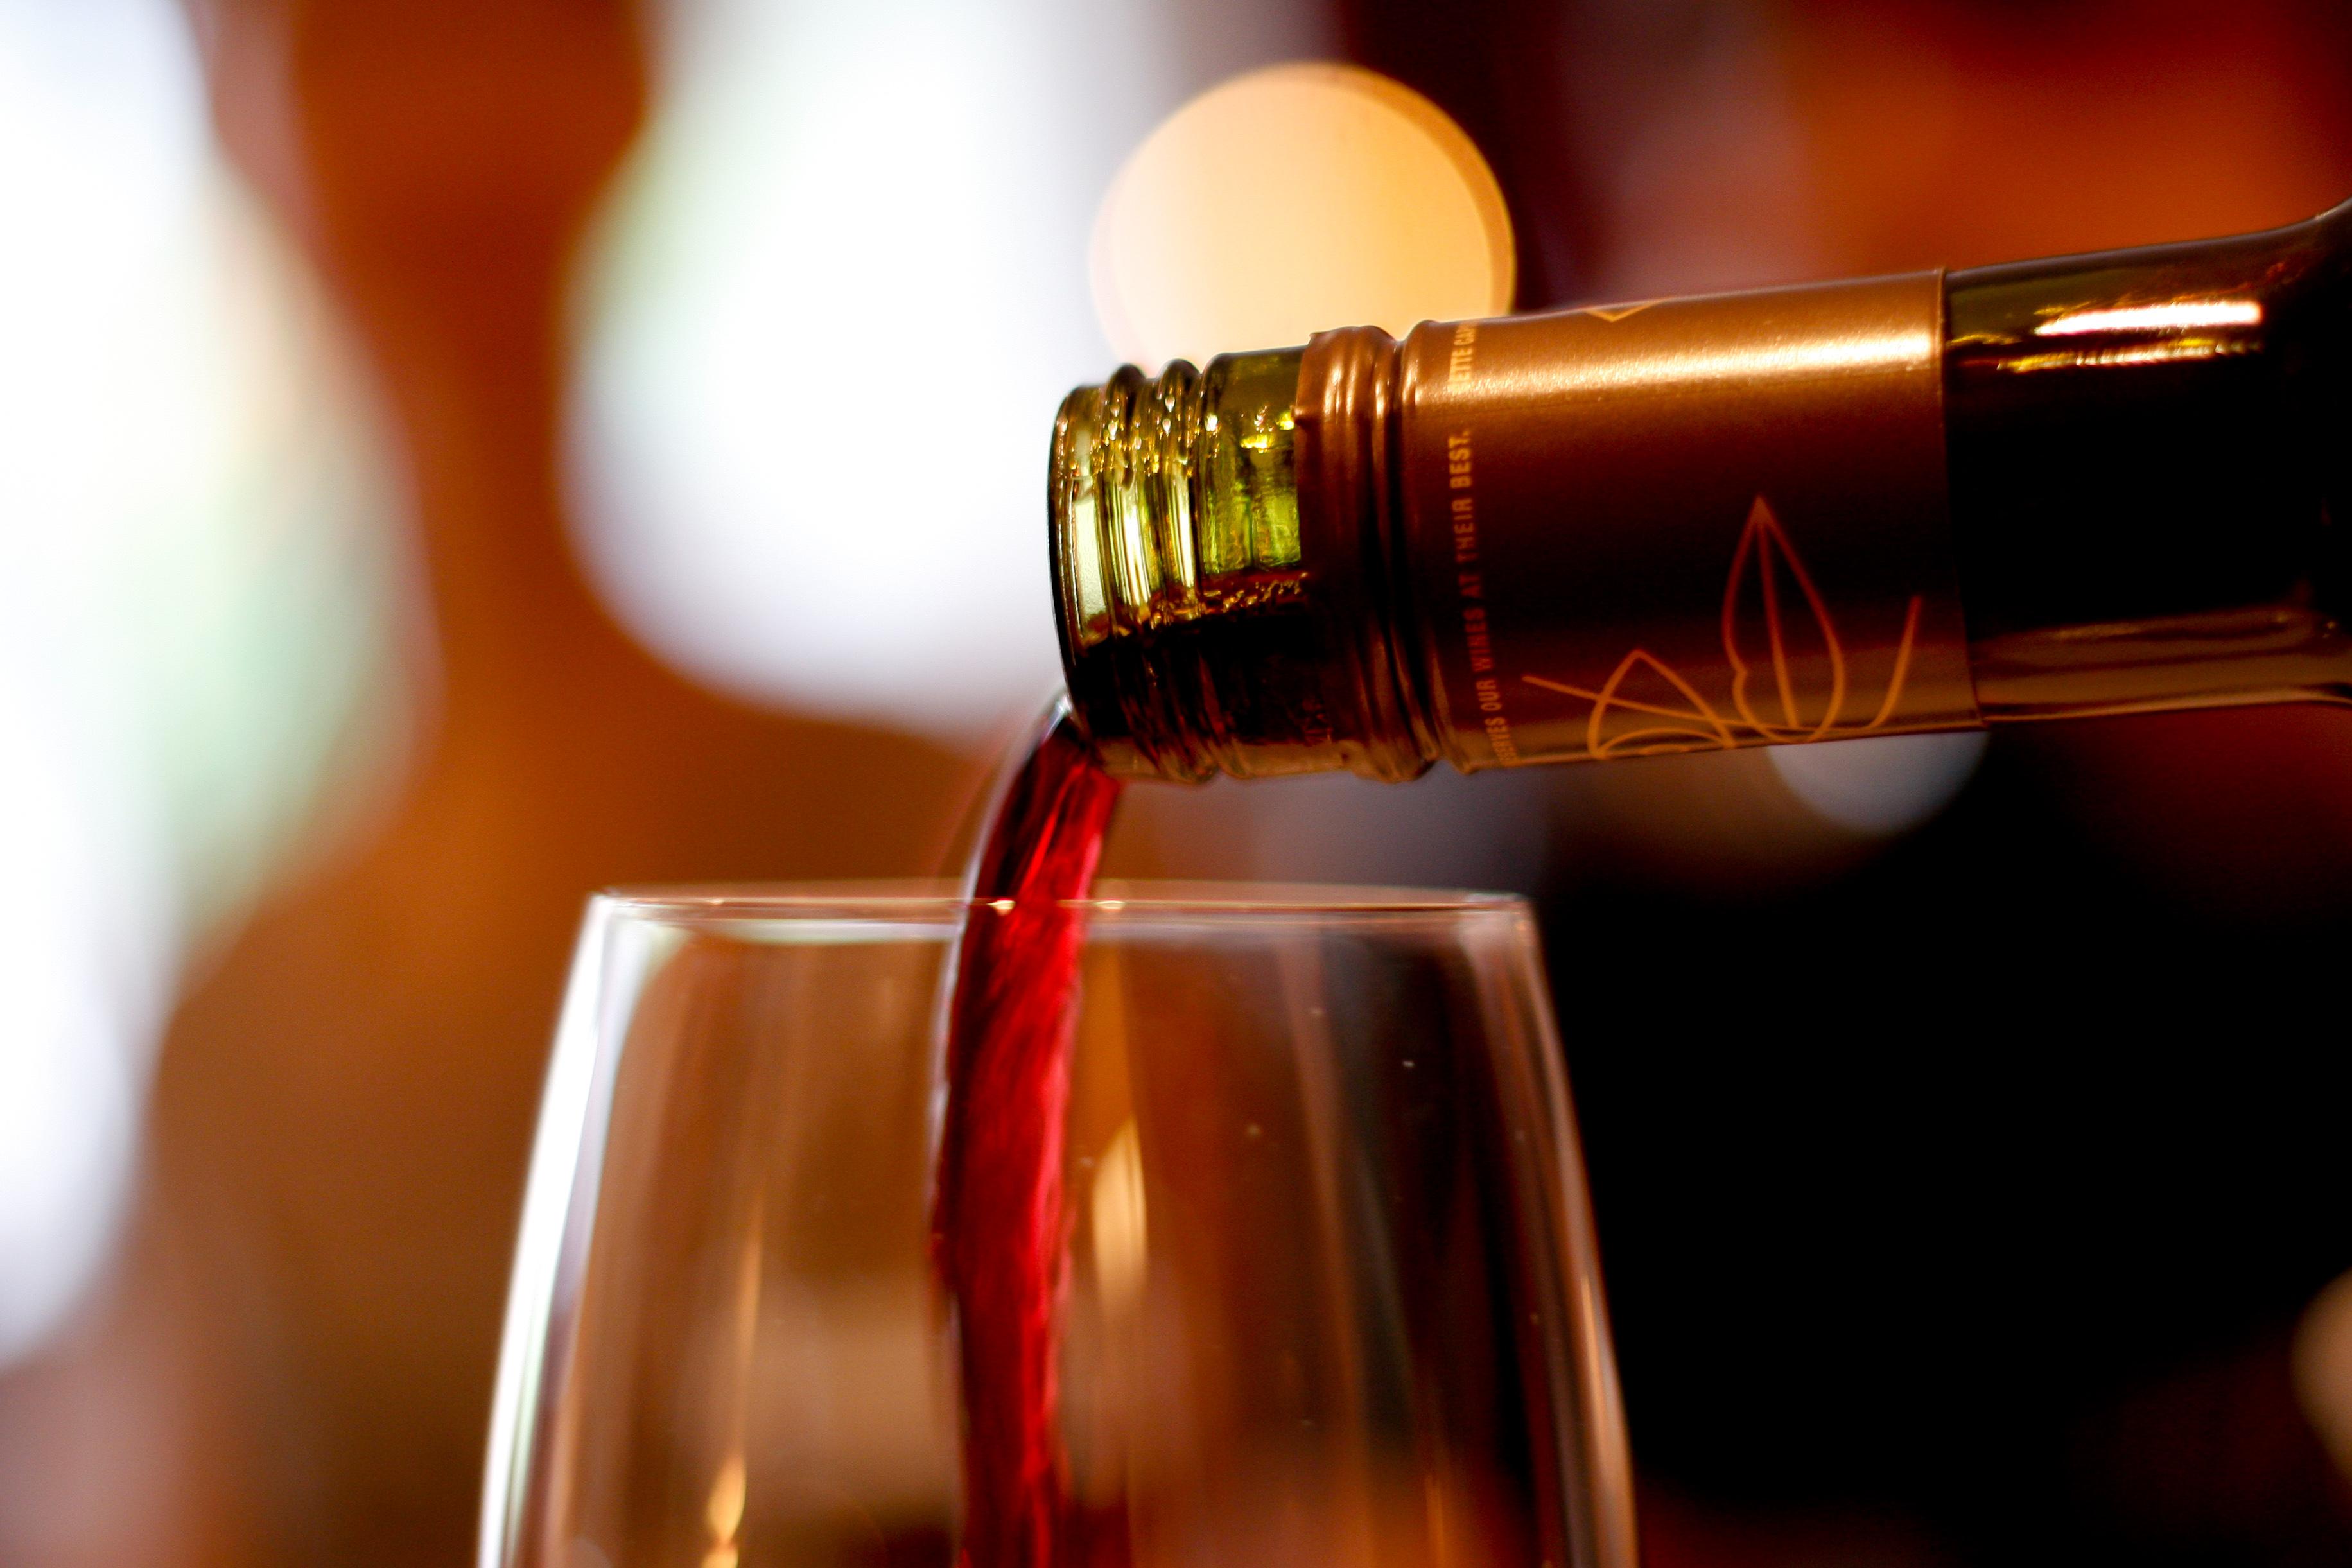 SHOP: MALBEC WINE